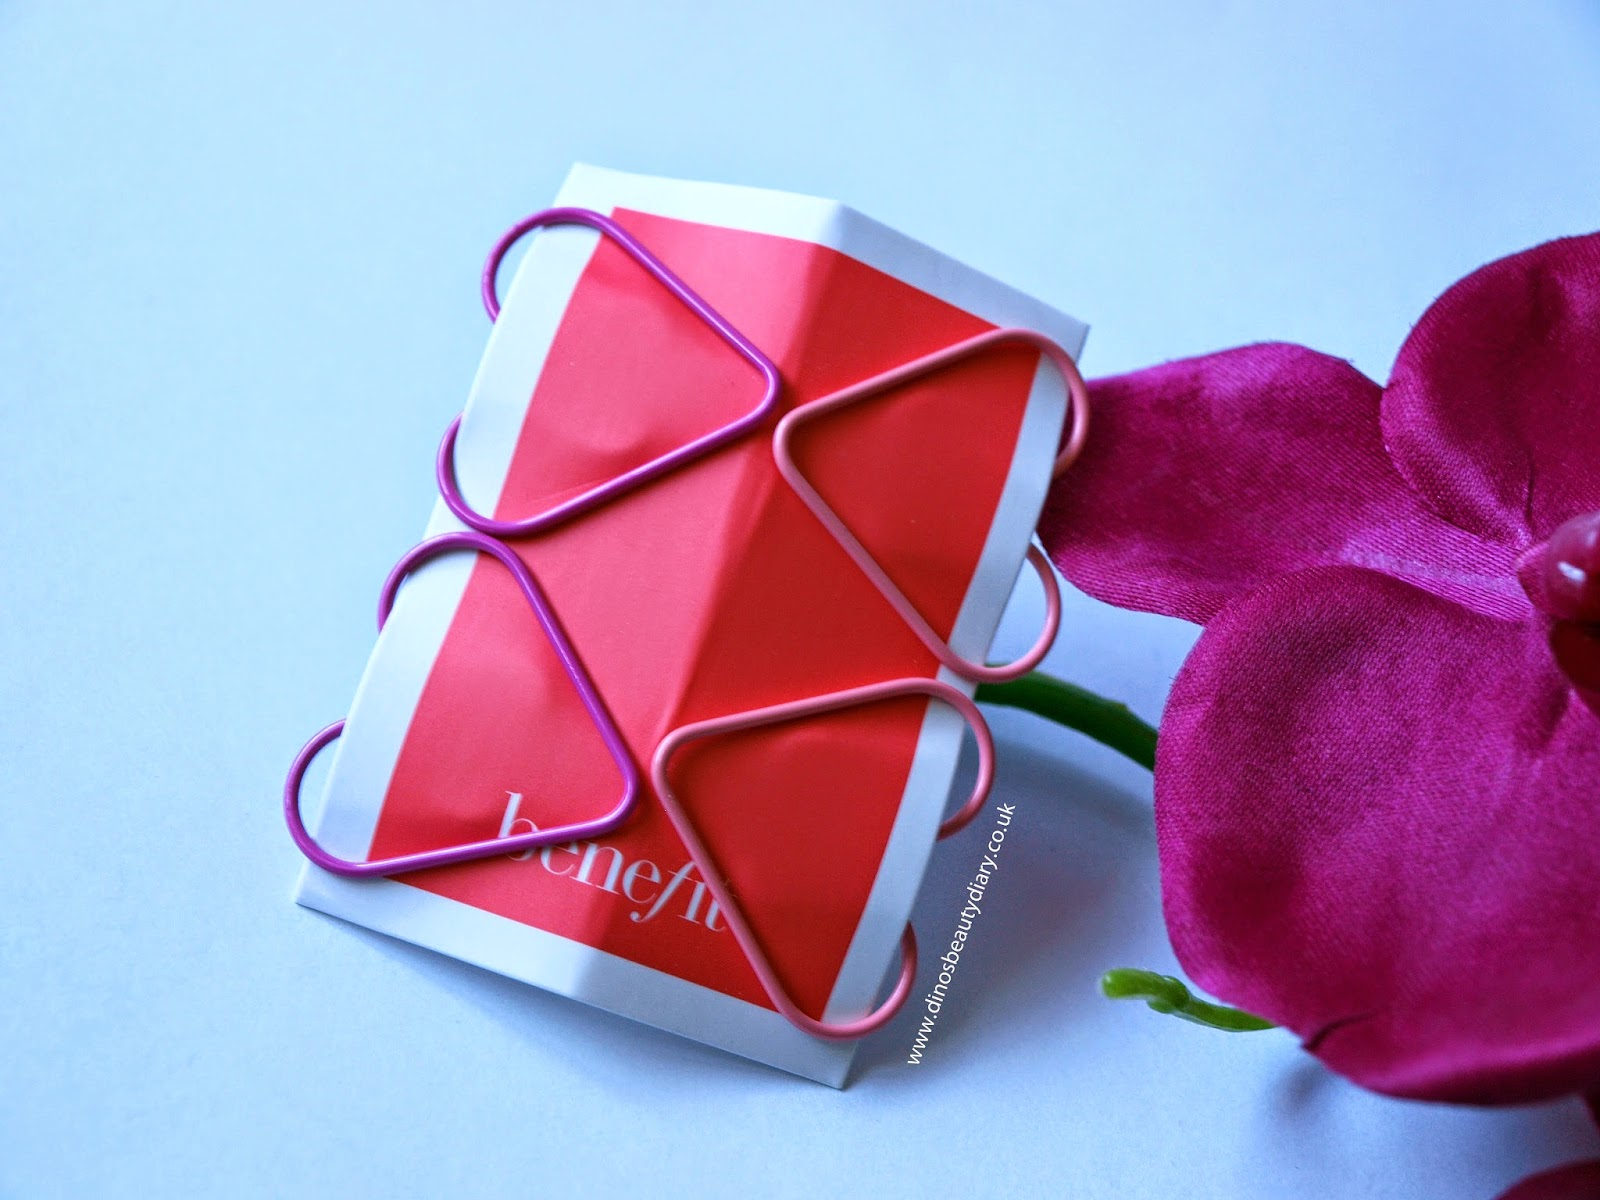 Benefit Advent Calendar - Days 1,2,3,4 - Dino's Beauty Diary